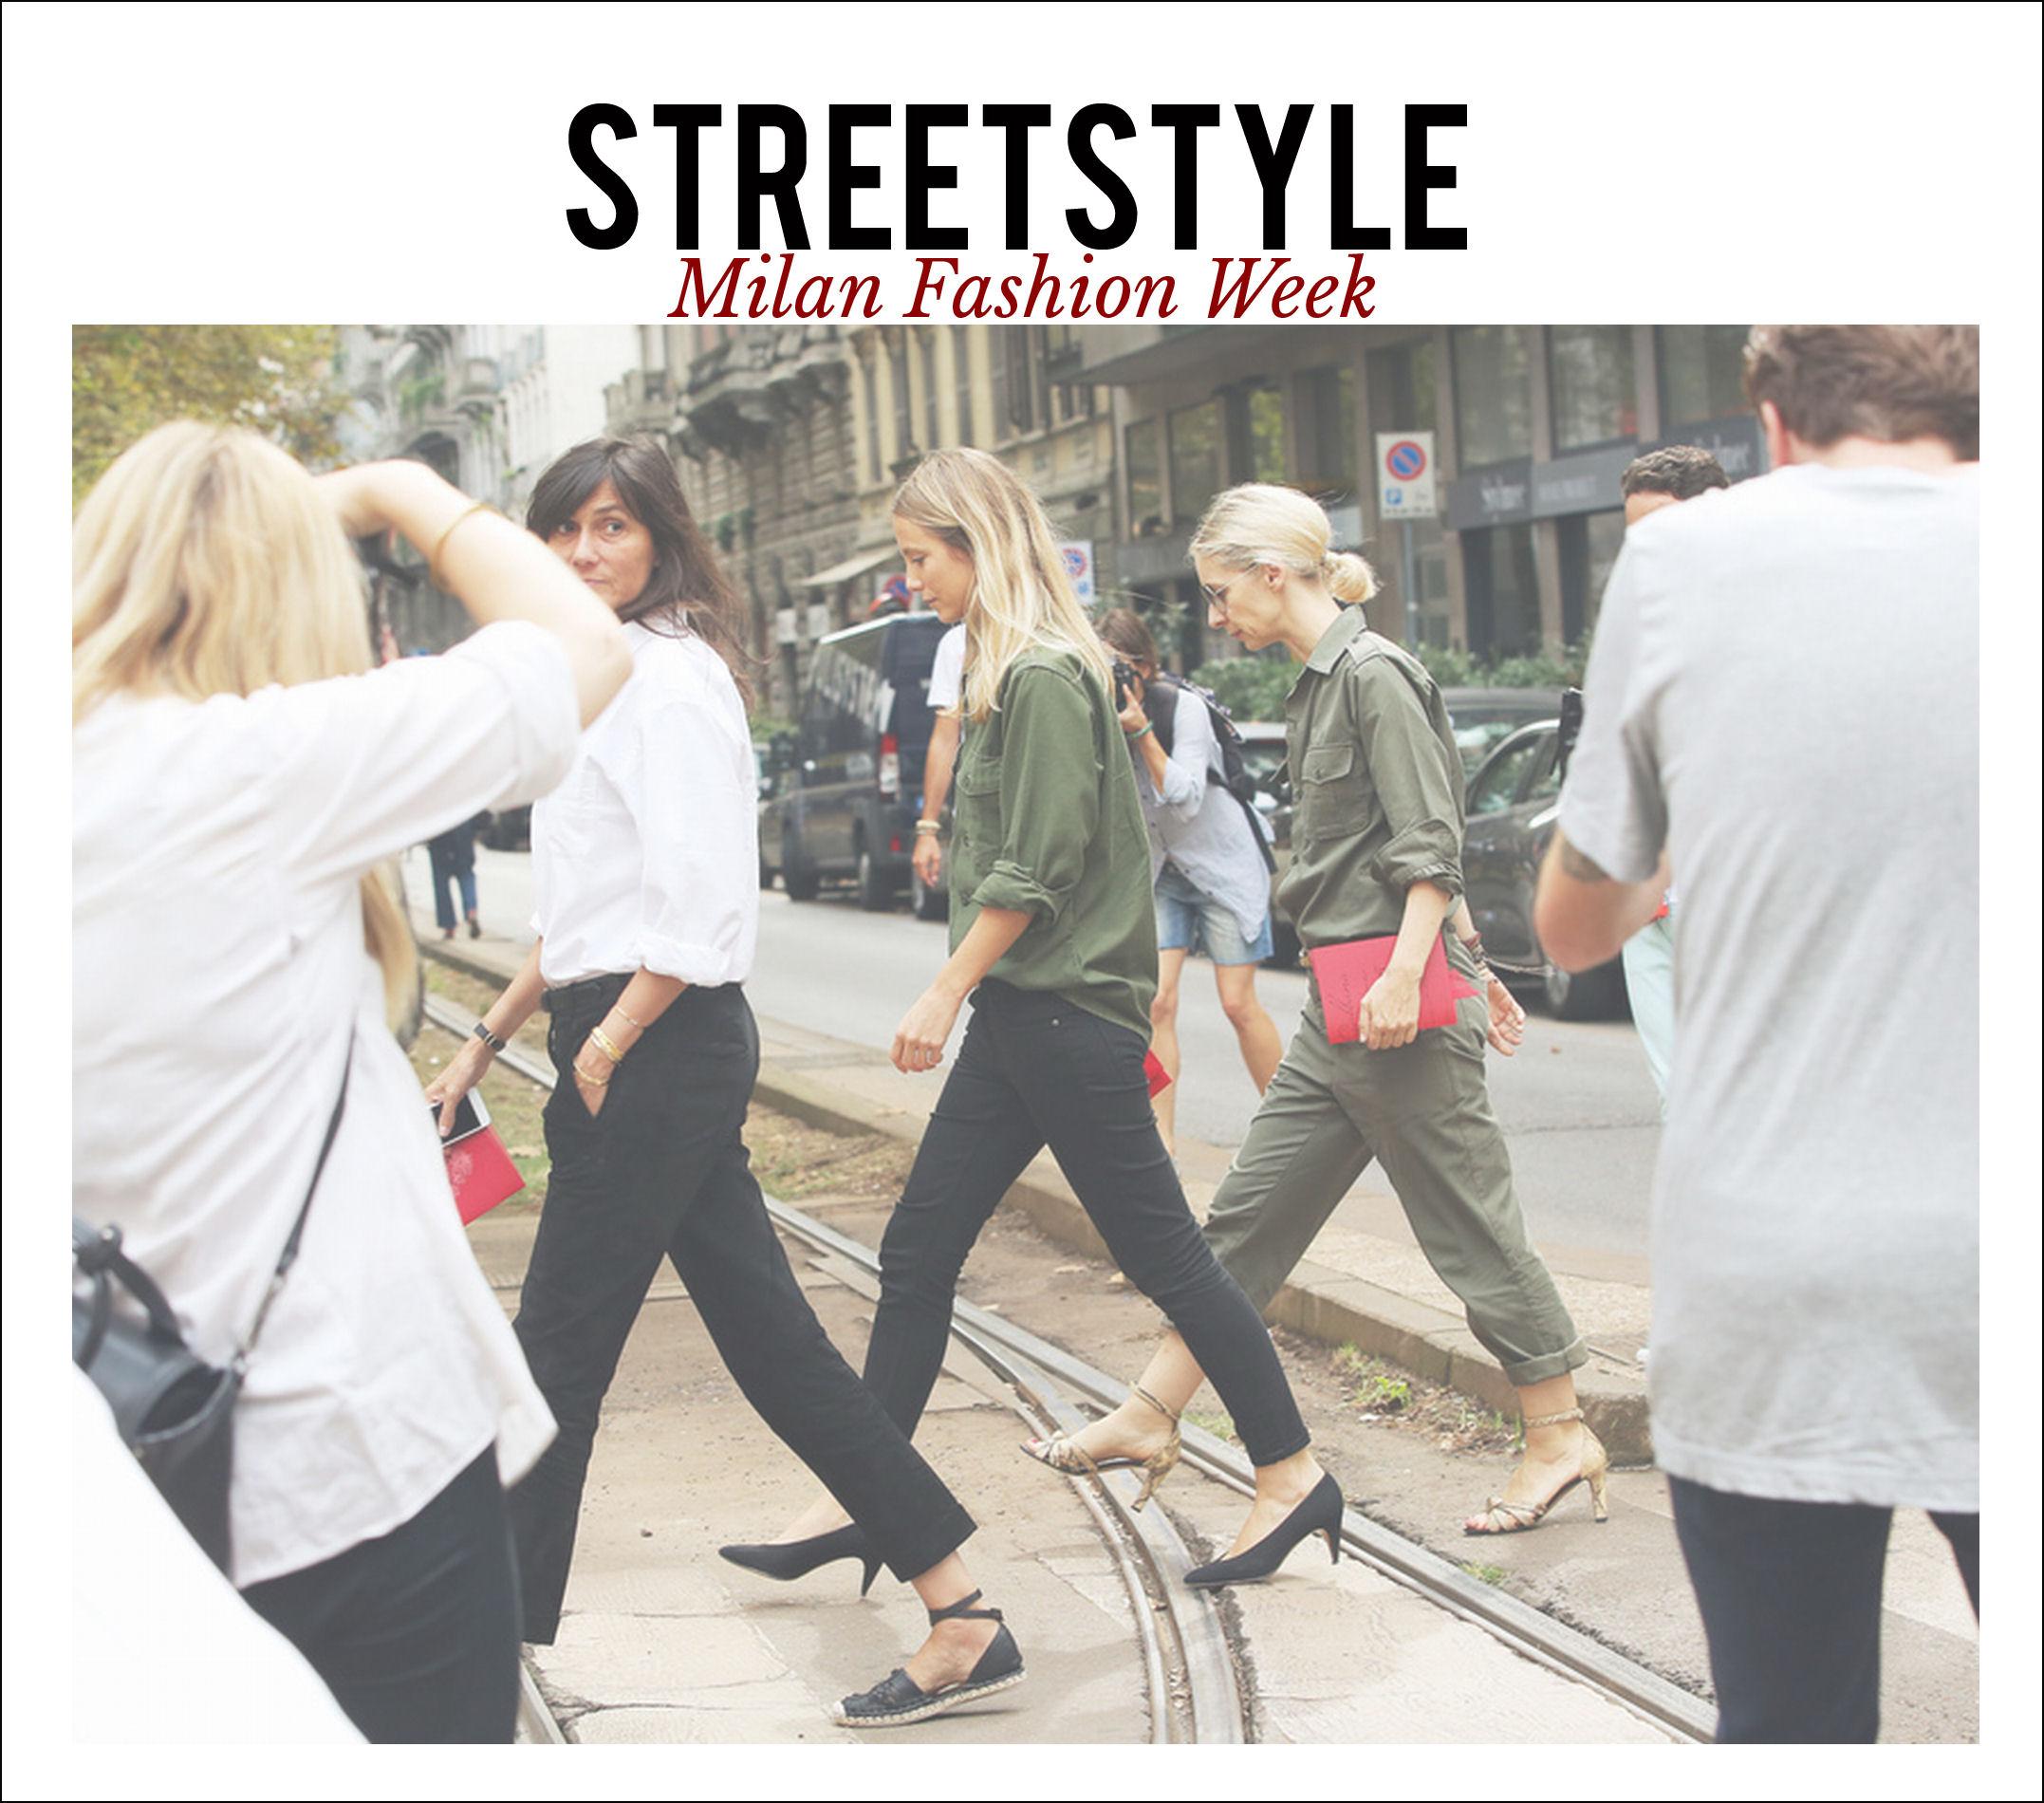 STREETSTYLE: MILAN FASHION WEEK - My Daily Style